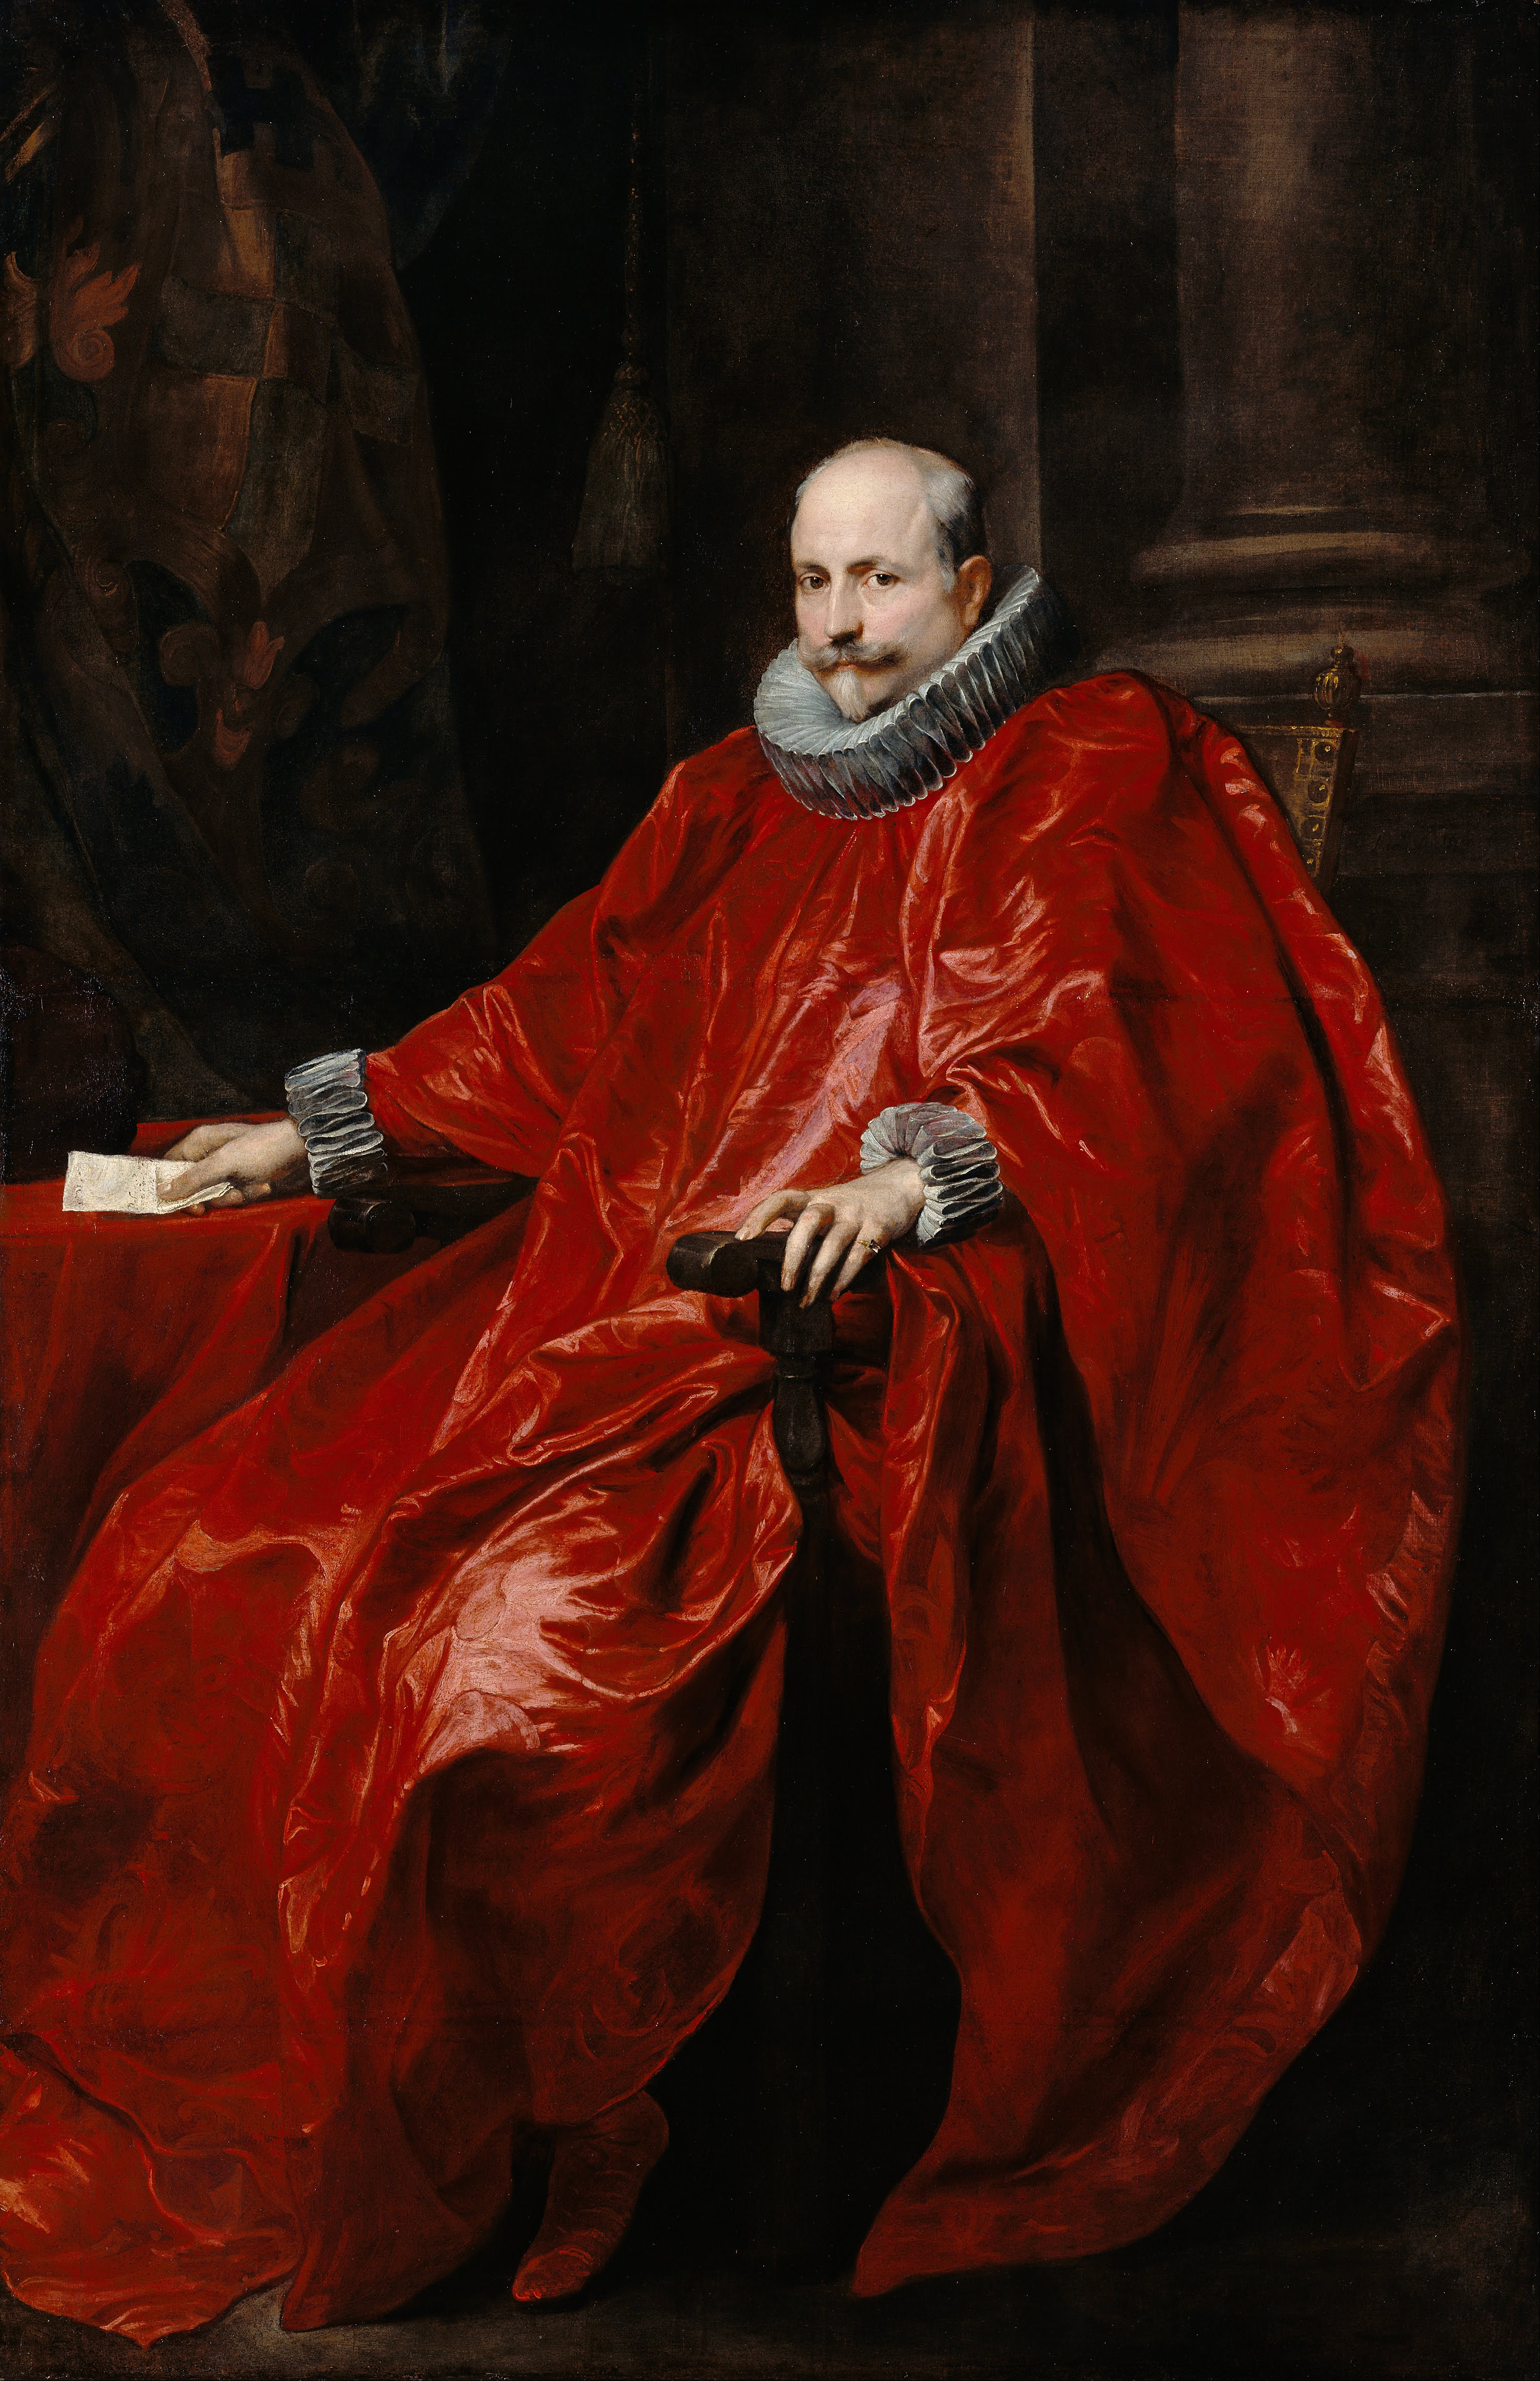 Anthony van Dyck: Portrait of Agostino Pallavicini